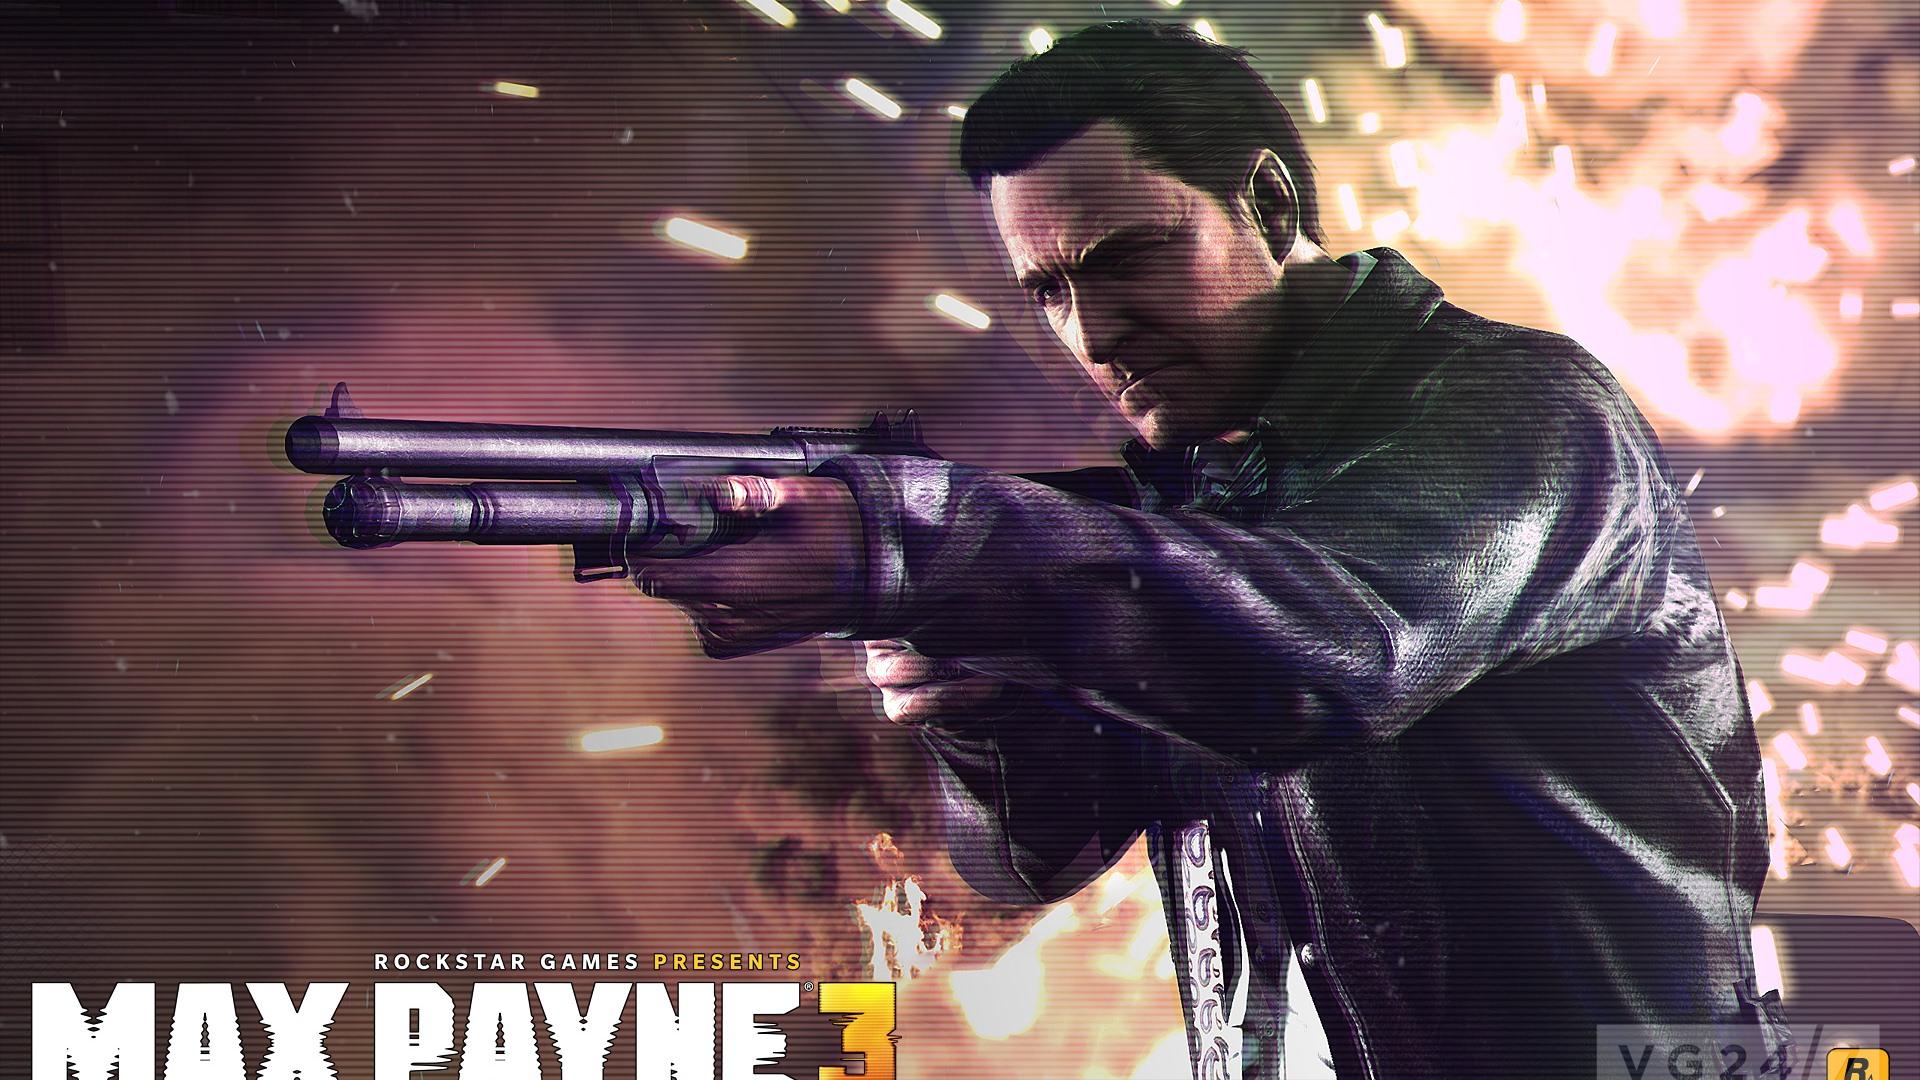 Max Payne 3 Hd Wallpapers 13 1920x1080 Wallpaper Download Max